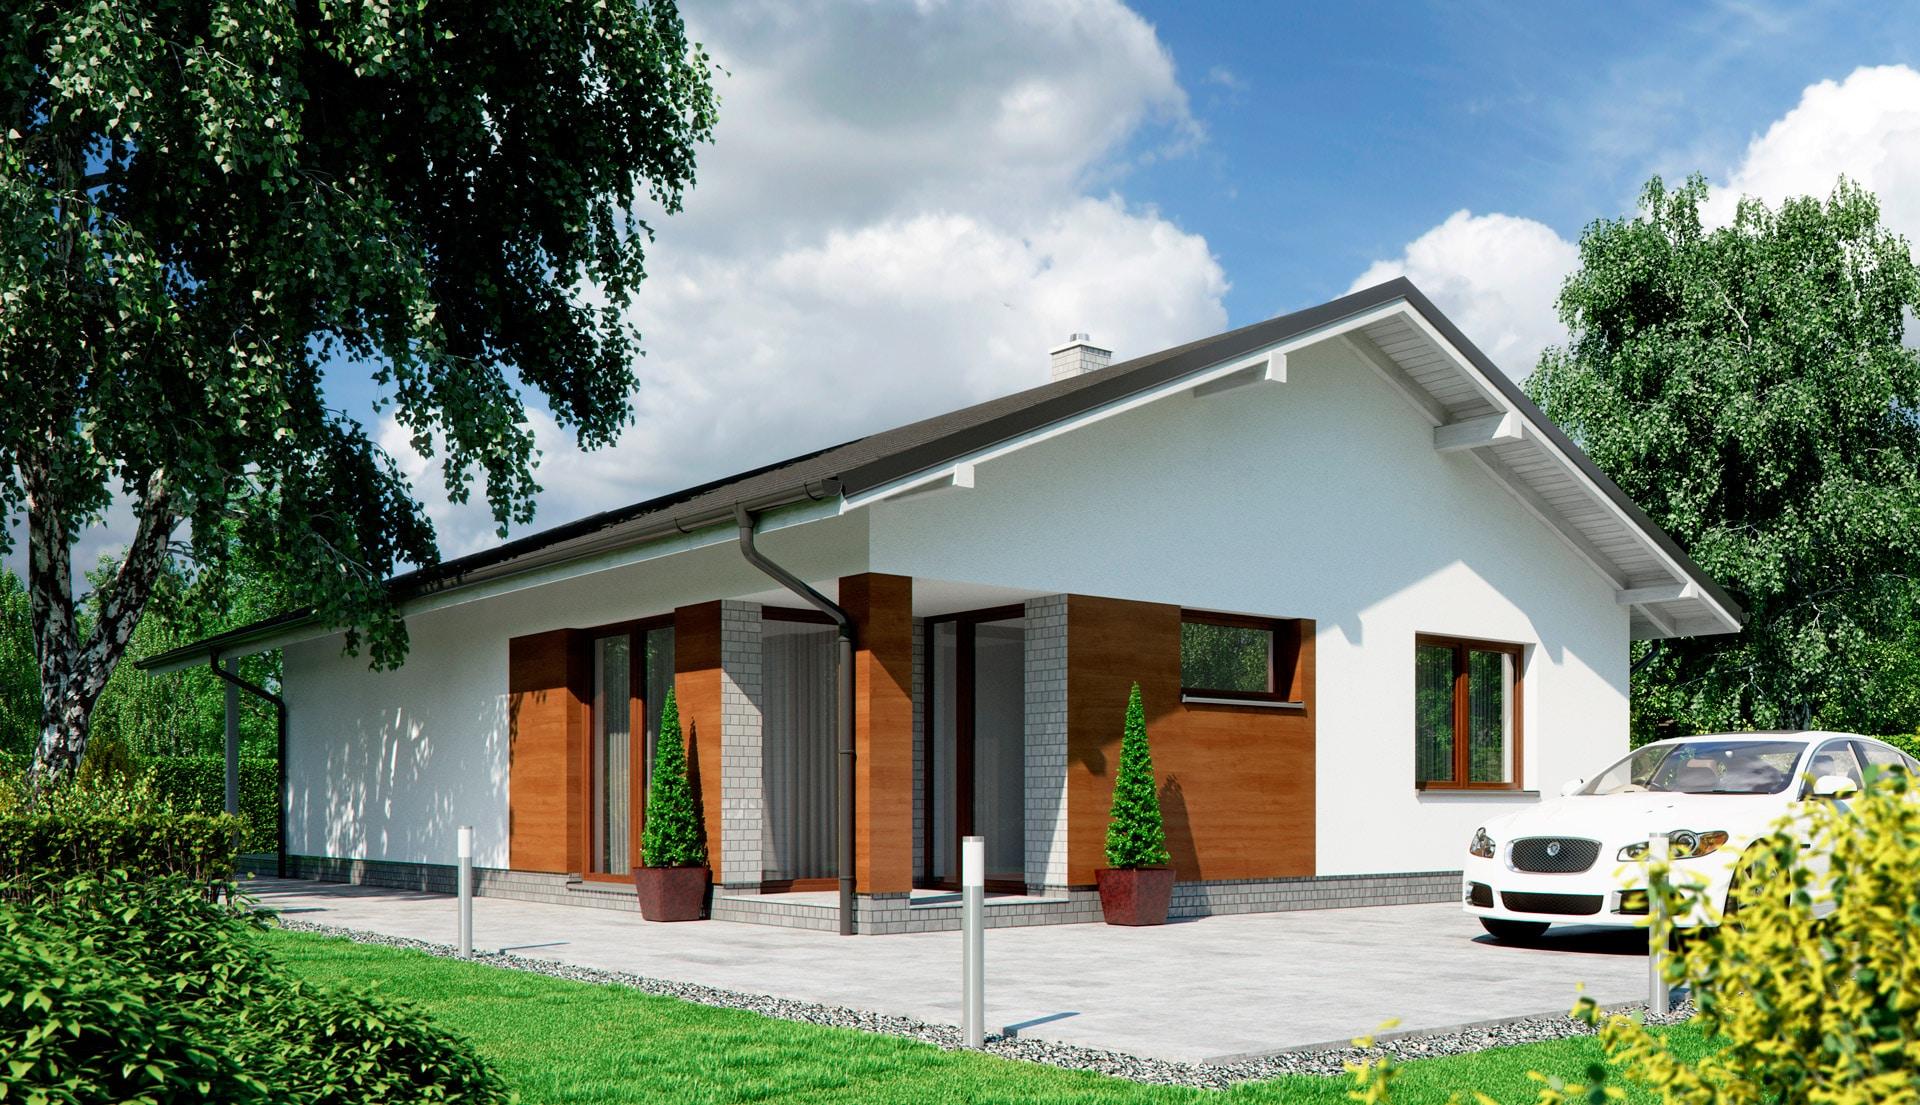 Проект одноэтажного дома c террасой «КО-143» - фото №1